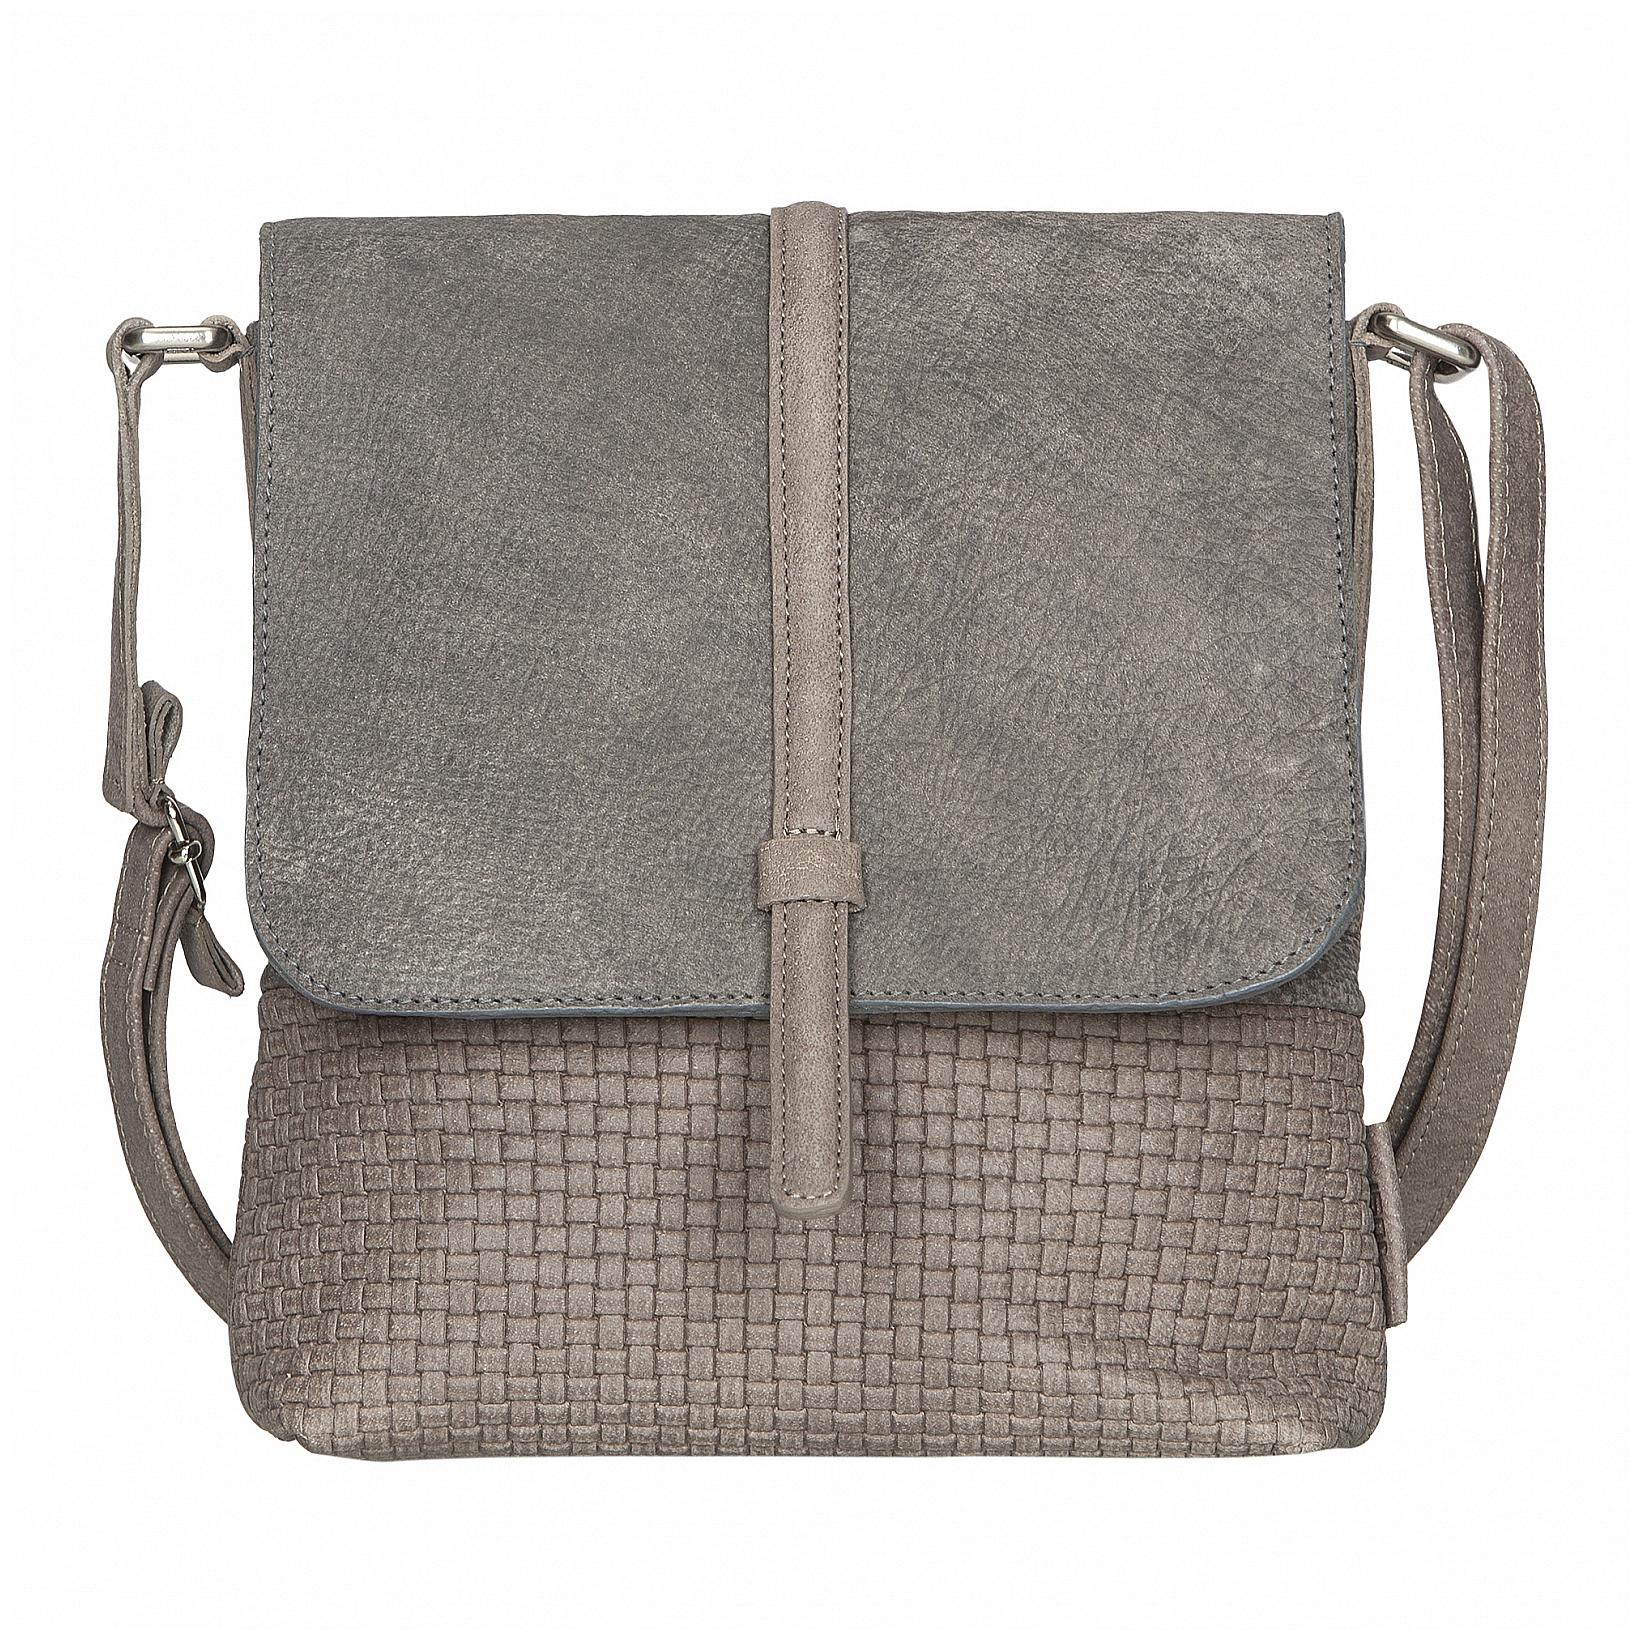 JOST Dámská kožená taška přes rameno TRECCIA 2579-804 pískovo-hnědá